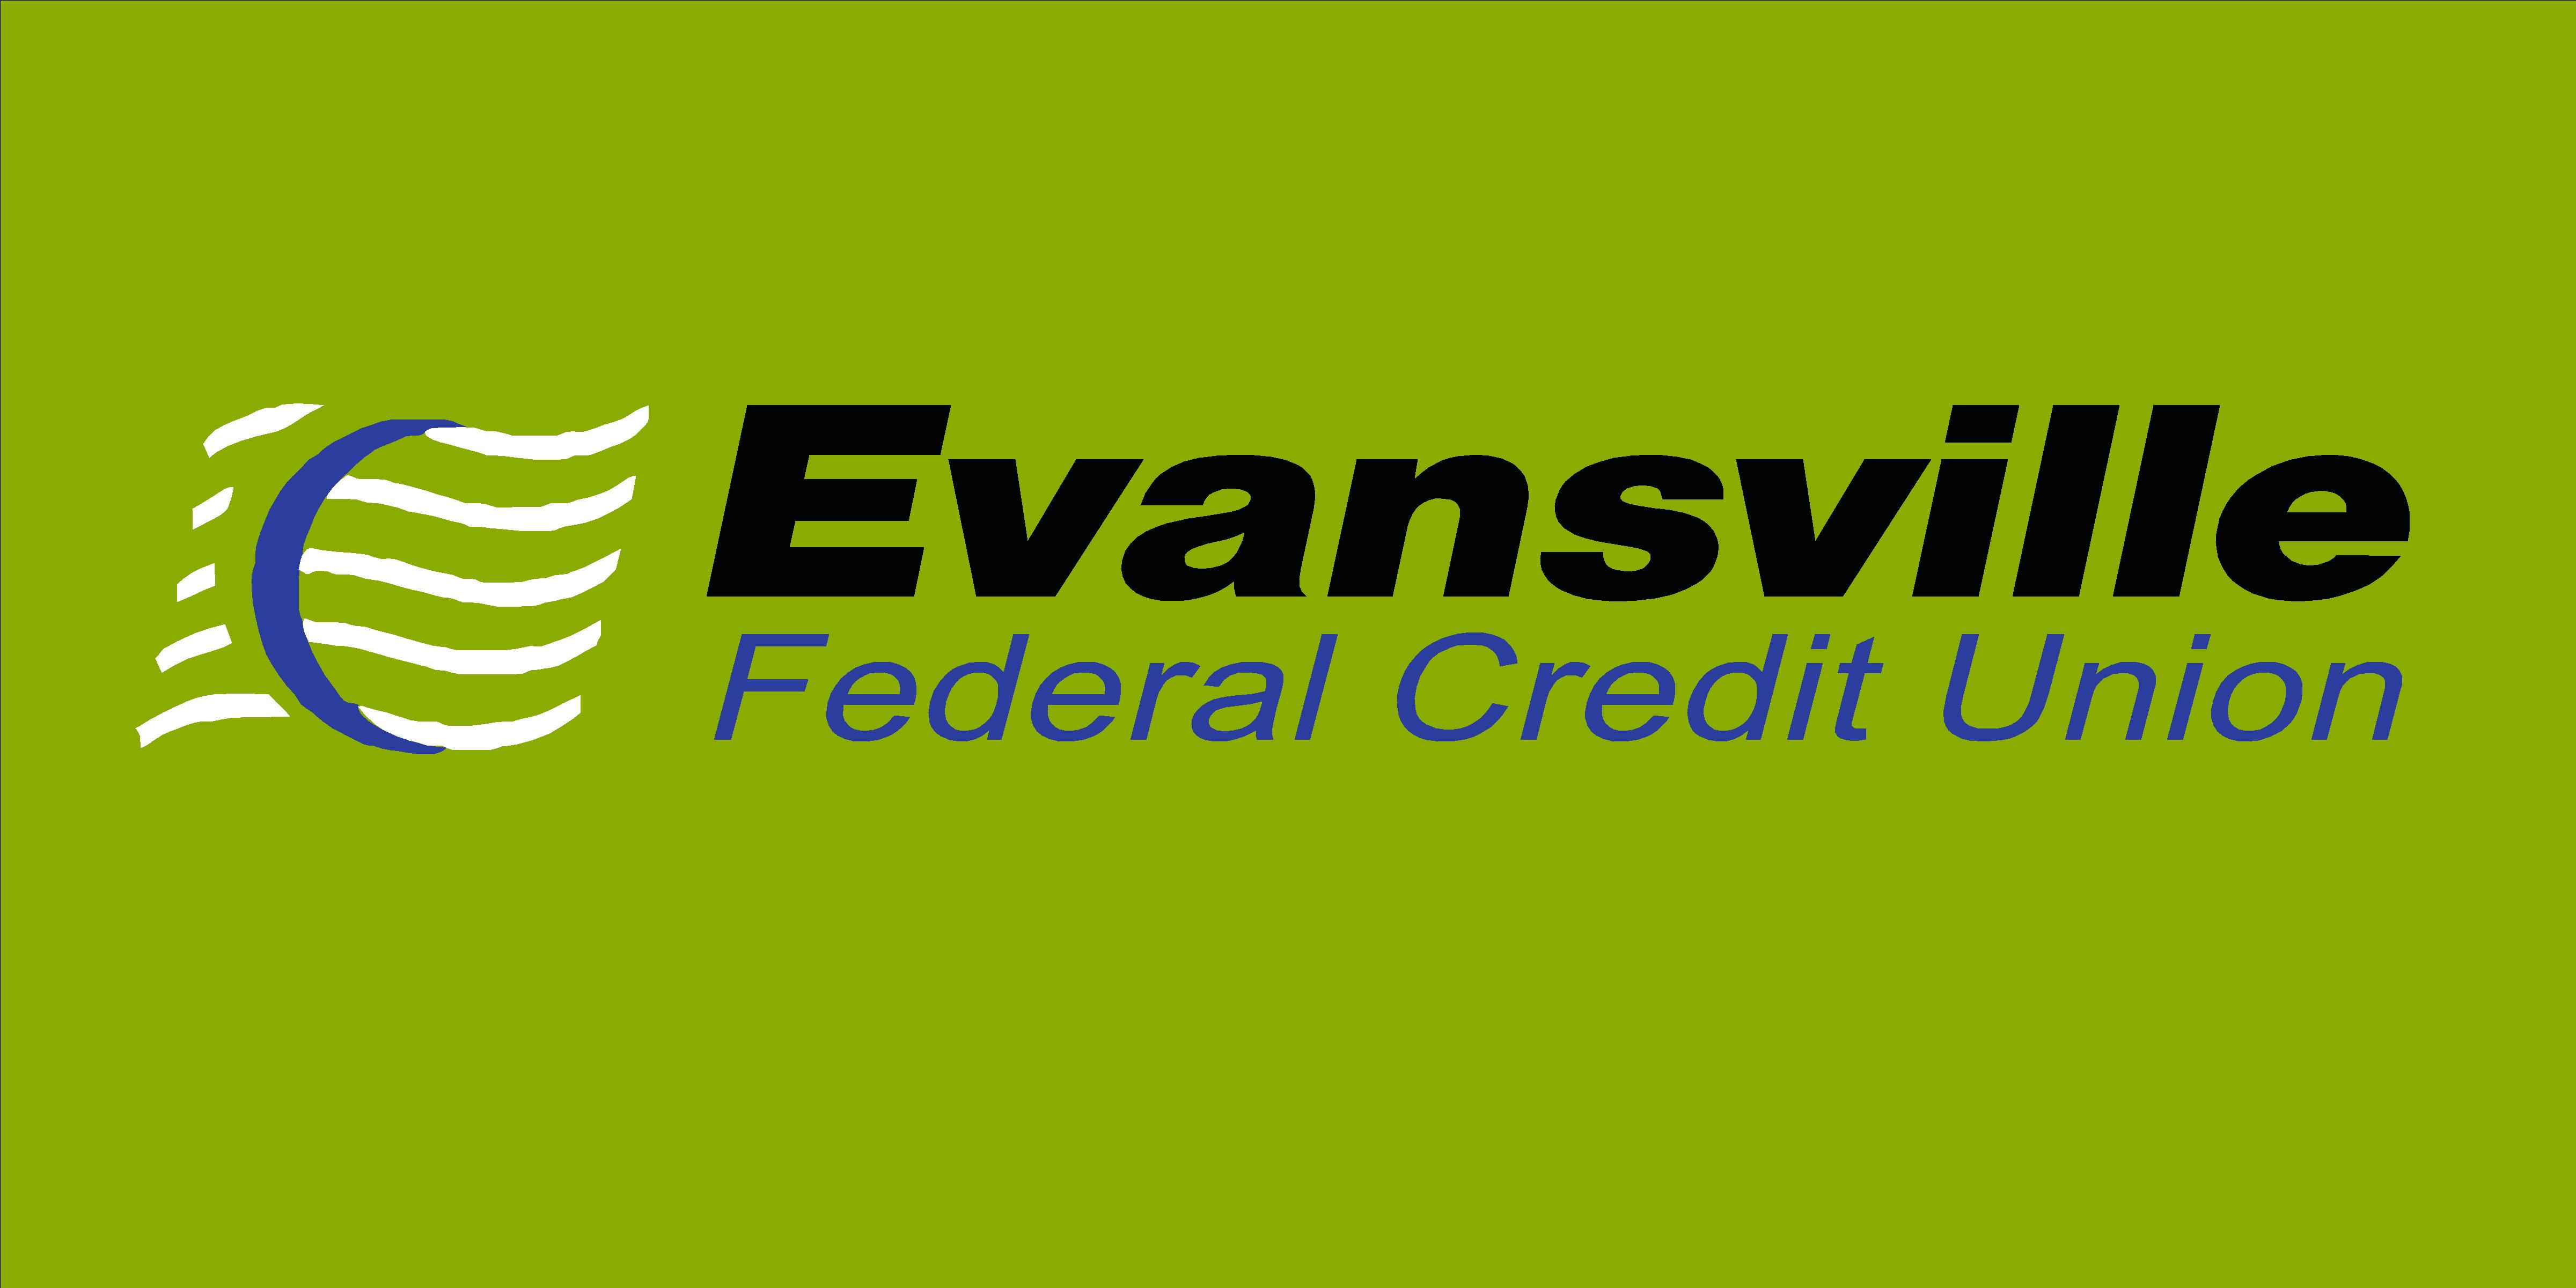 Evansville-Federal